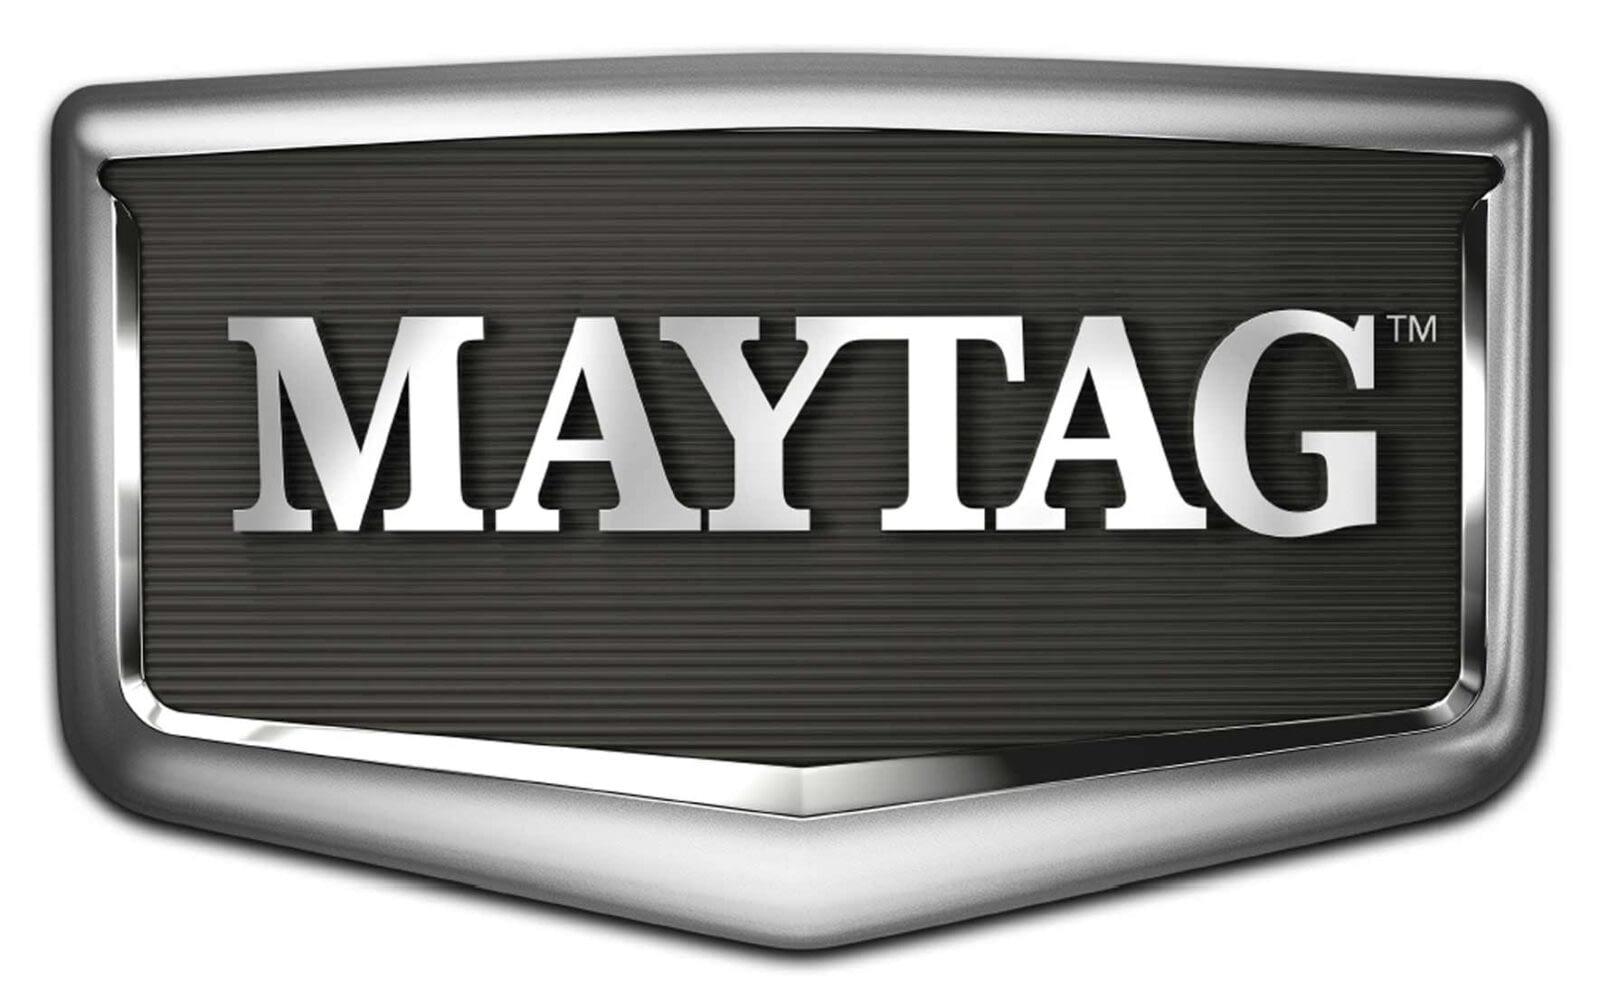 Maytag Liance Repair Atlanta